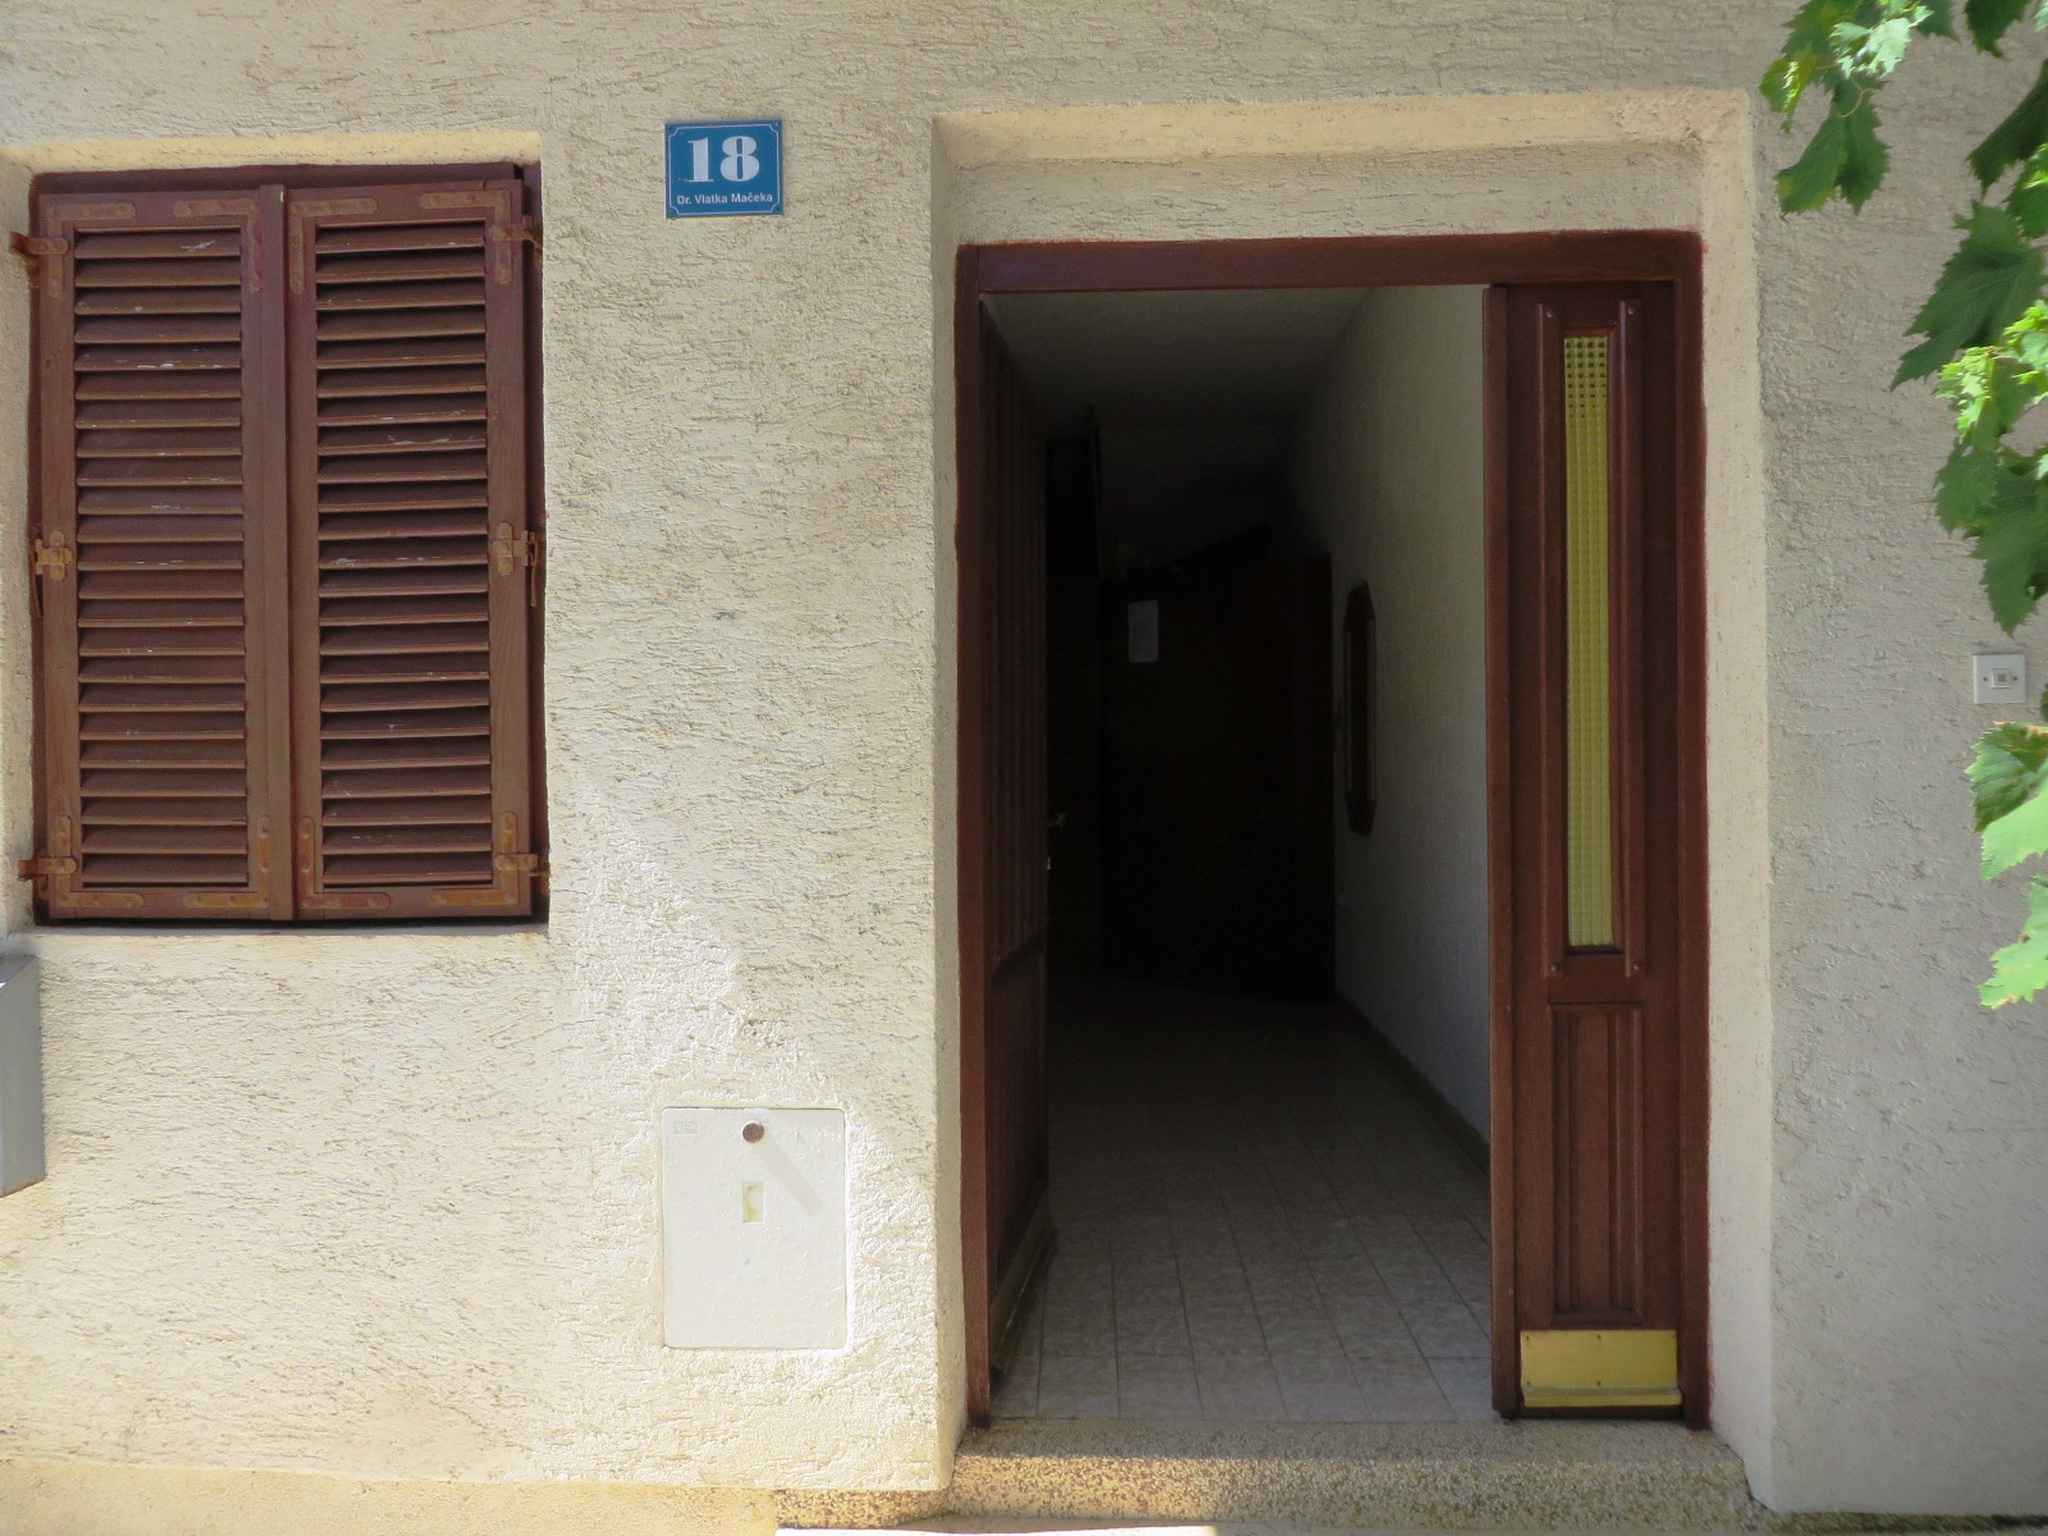 Ferienhaus samo 80 metara od Jadranskog mora (325274), Vrsi, , Dalmatien, Kroatien, Bild 3